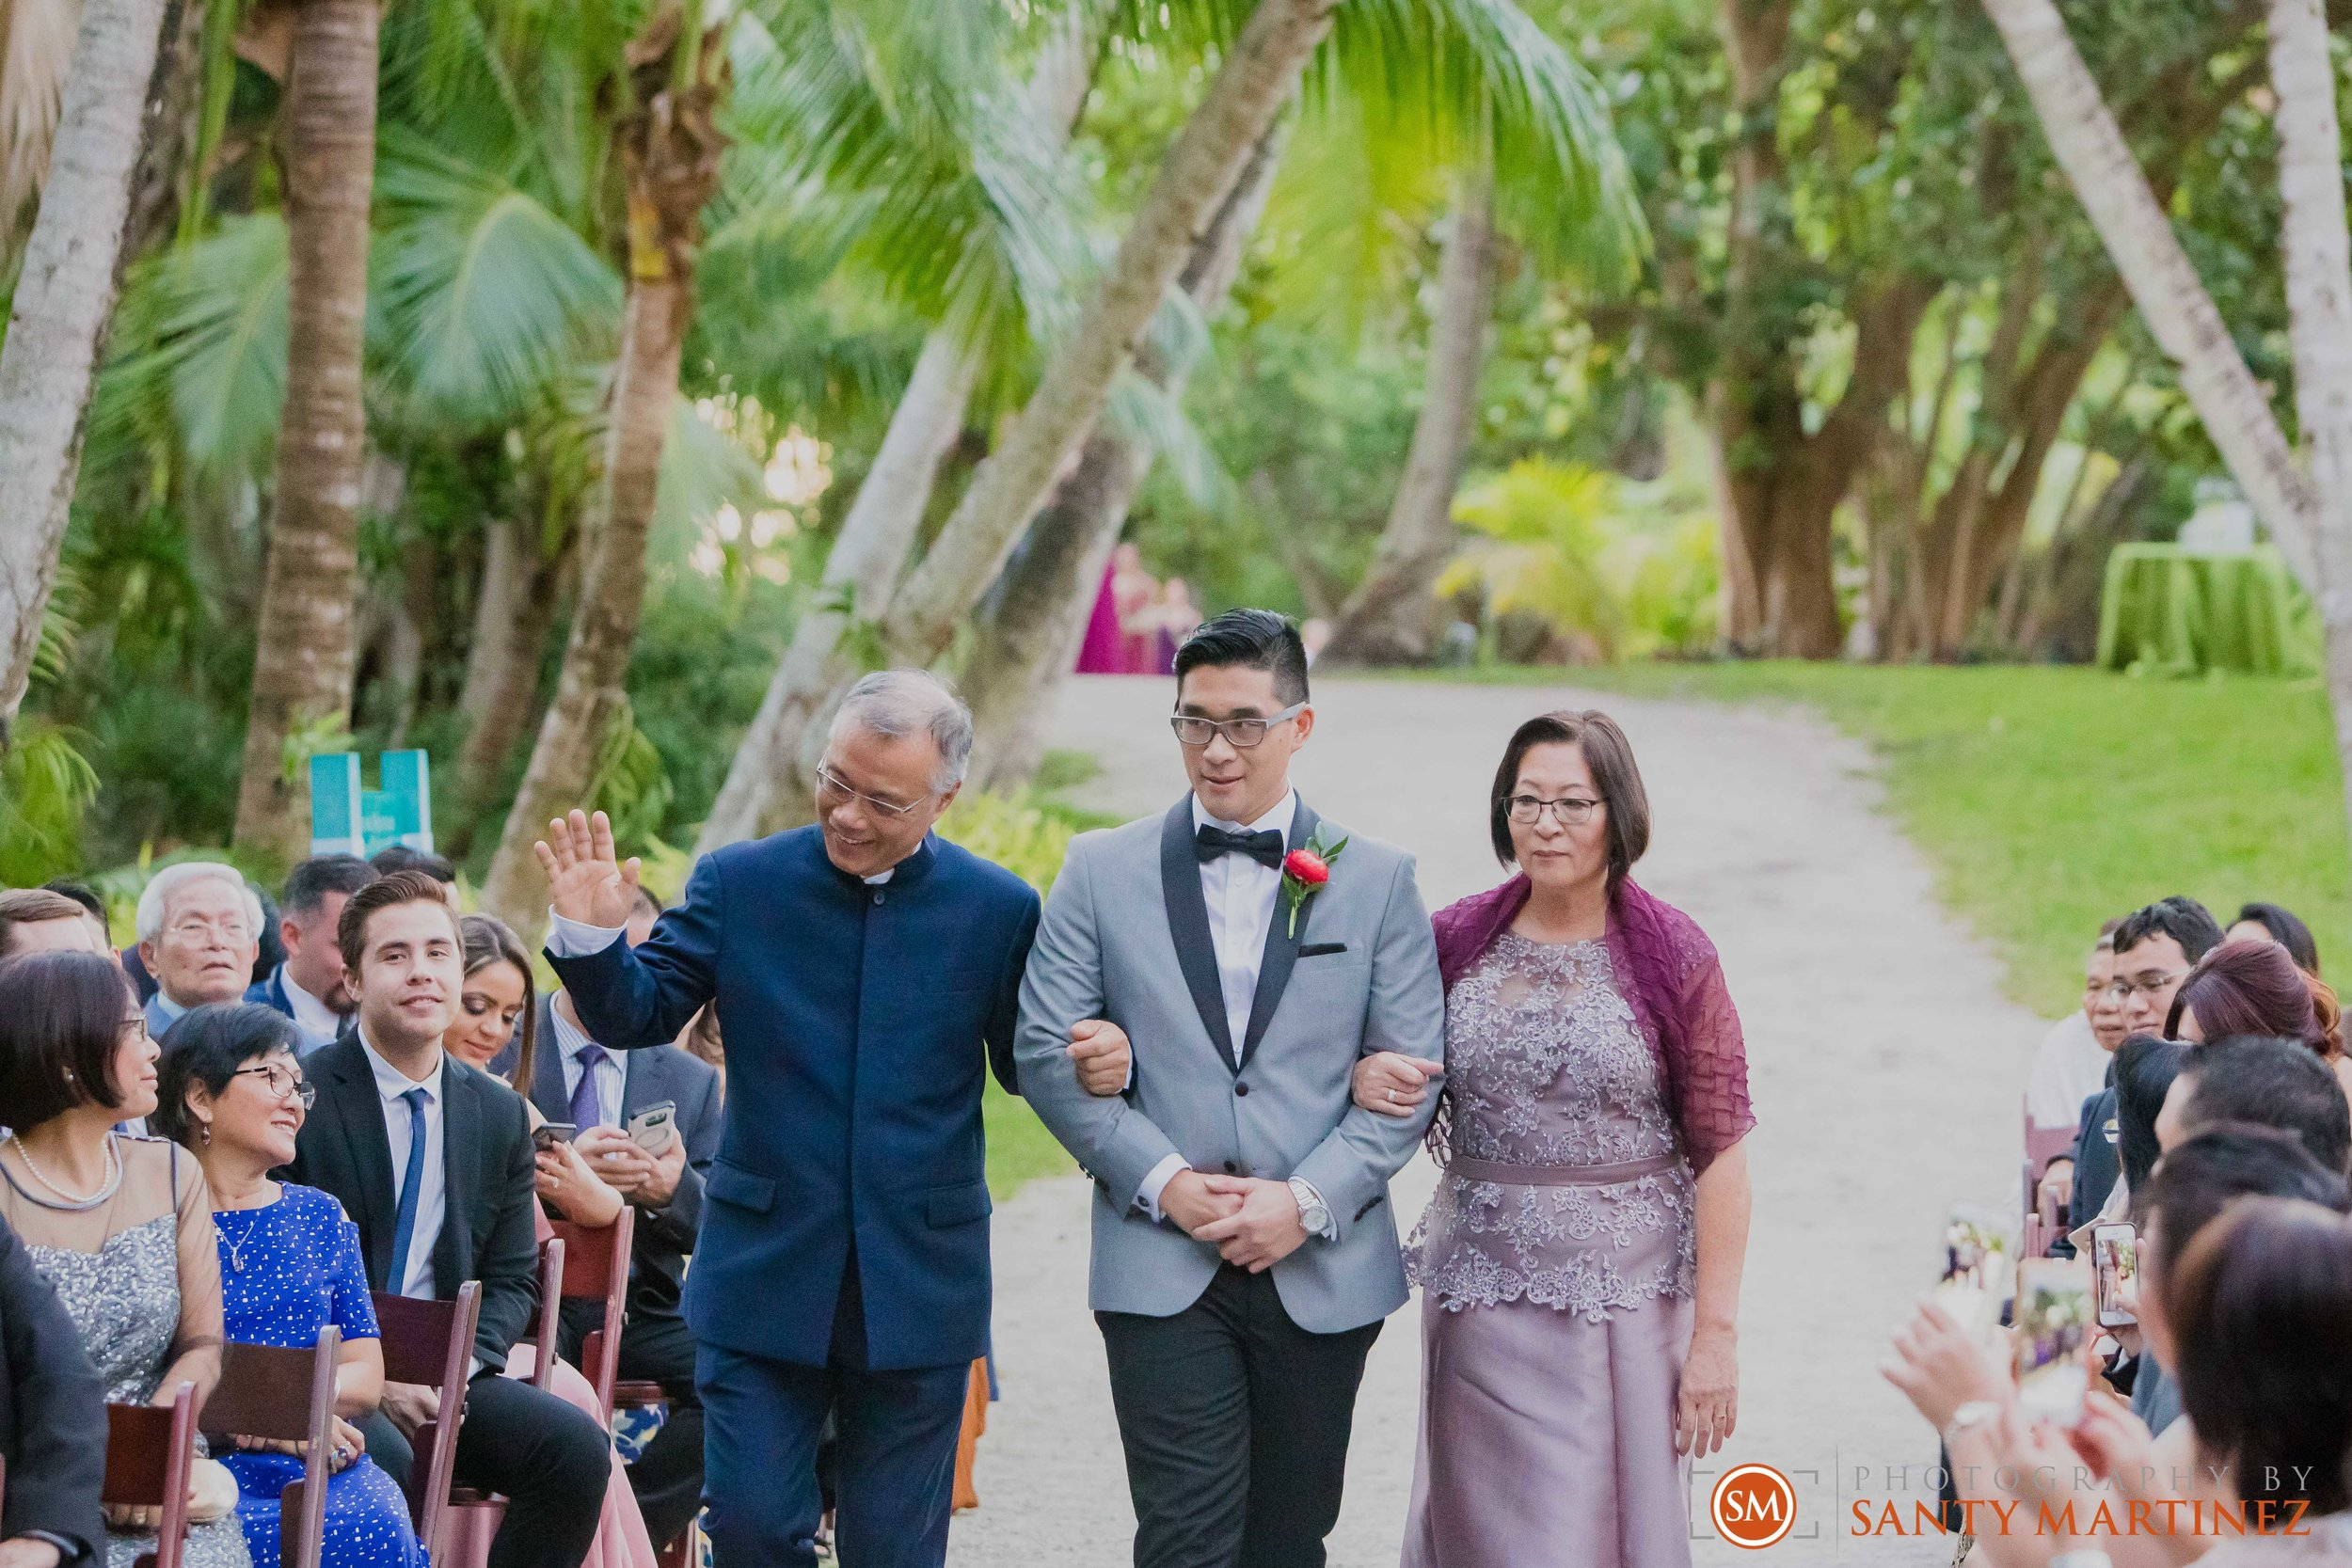 Wedding Bonnet House - Photography by Santy Martinez-24.jpg